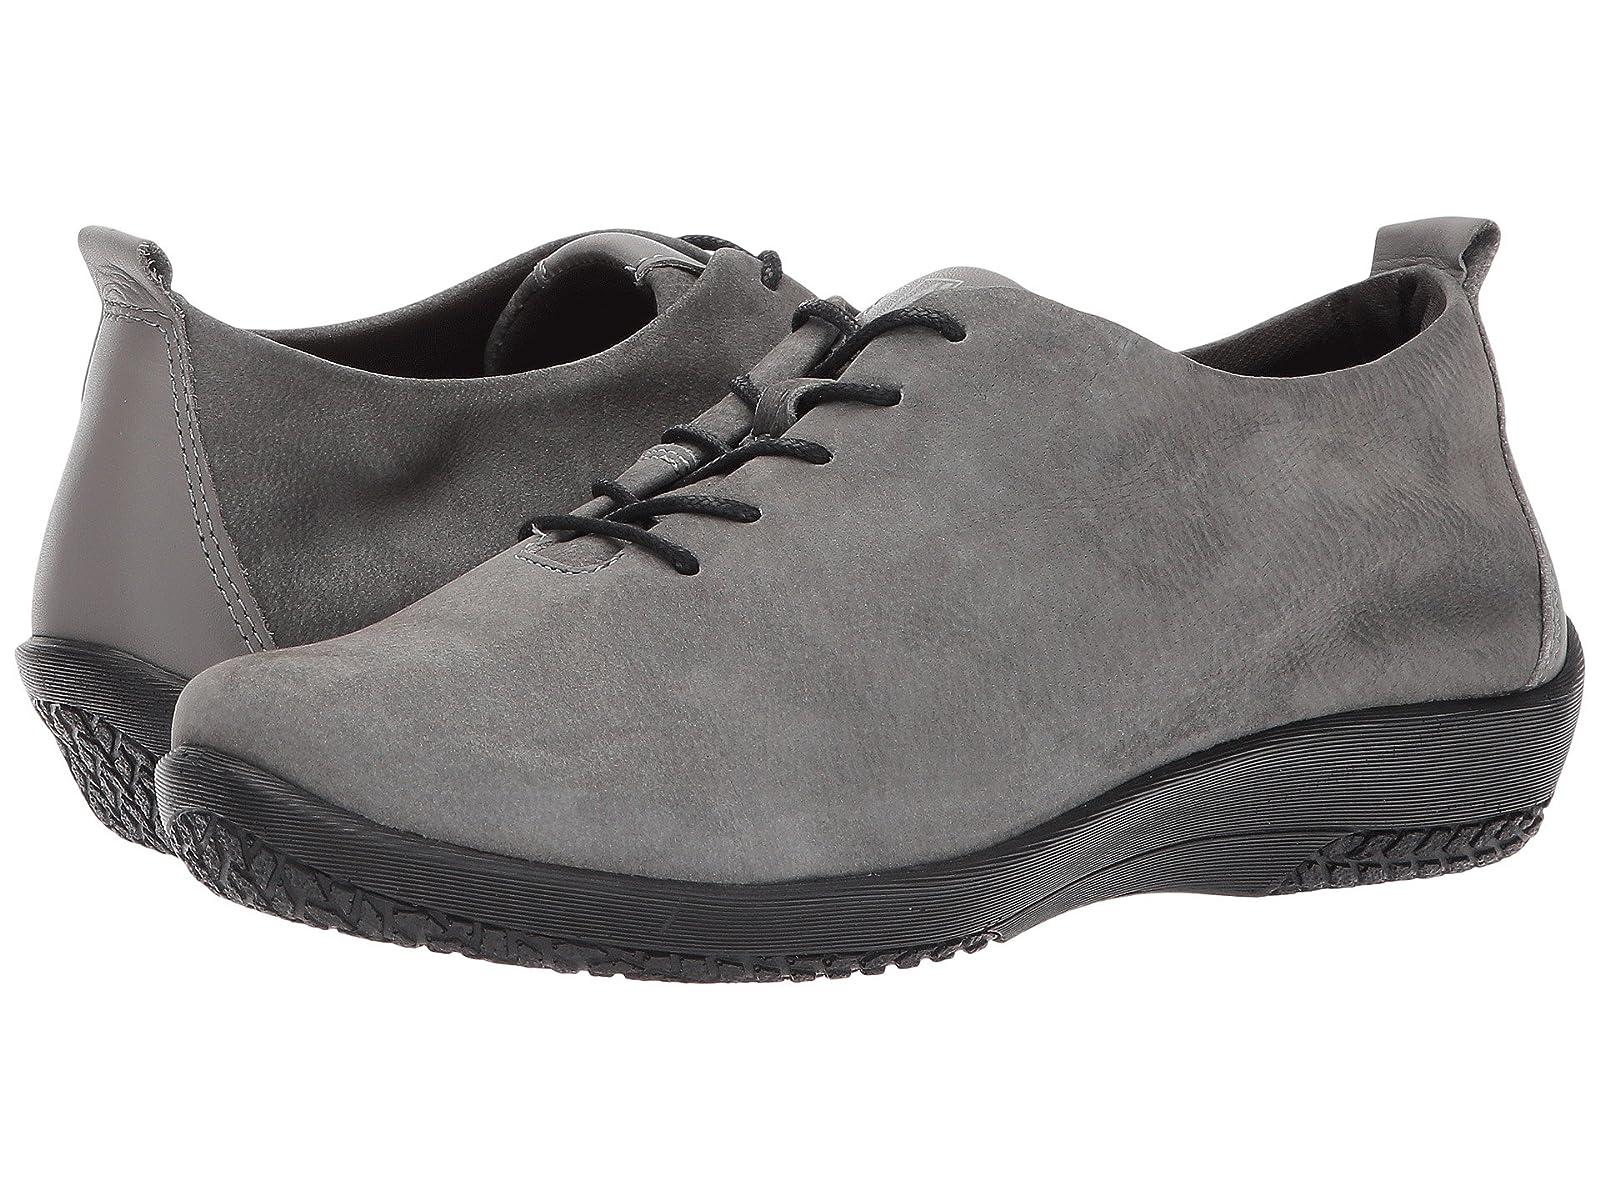 Arcopedico FrancescaAtmospheric grades have affordable shoes